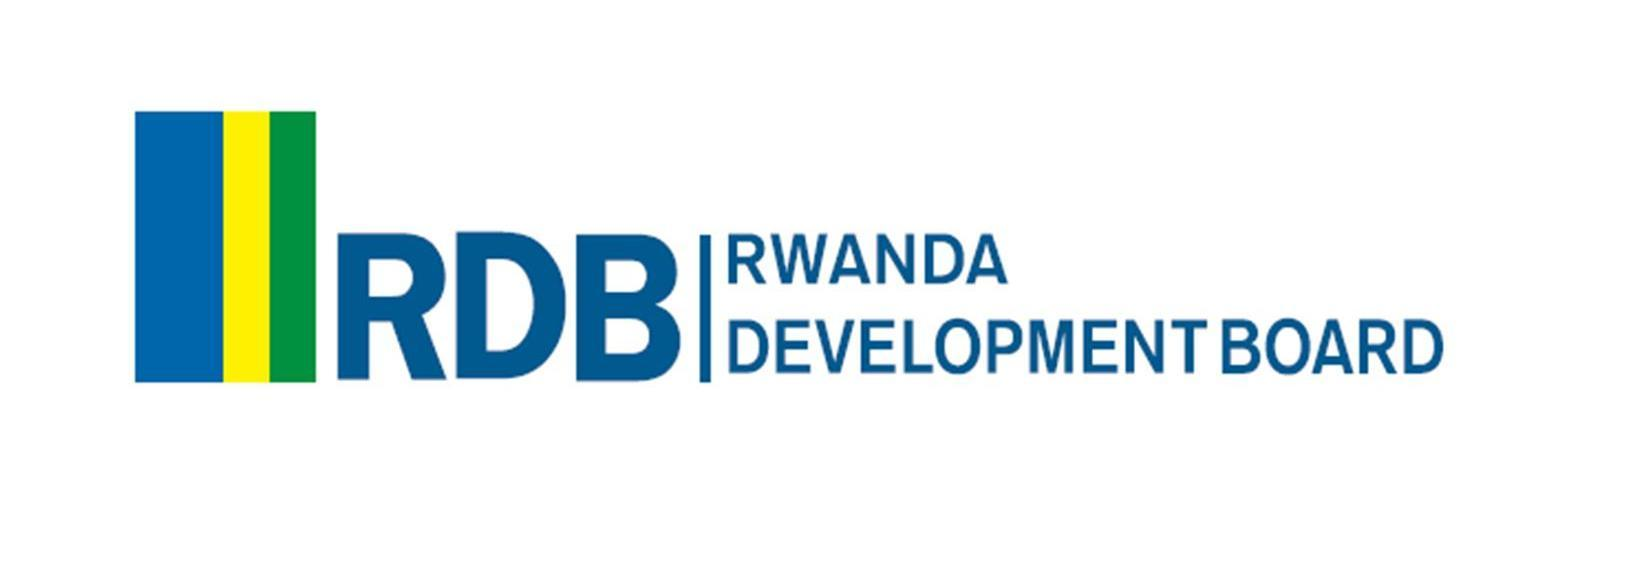 #Rwanda partners with #GIZ to train more bird guides